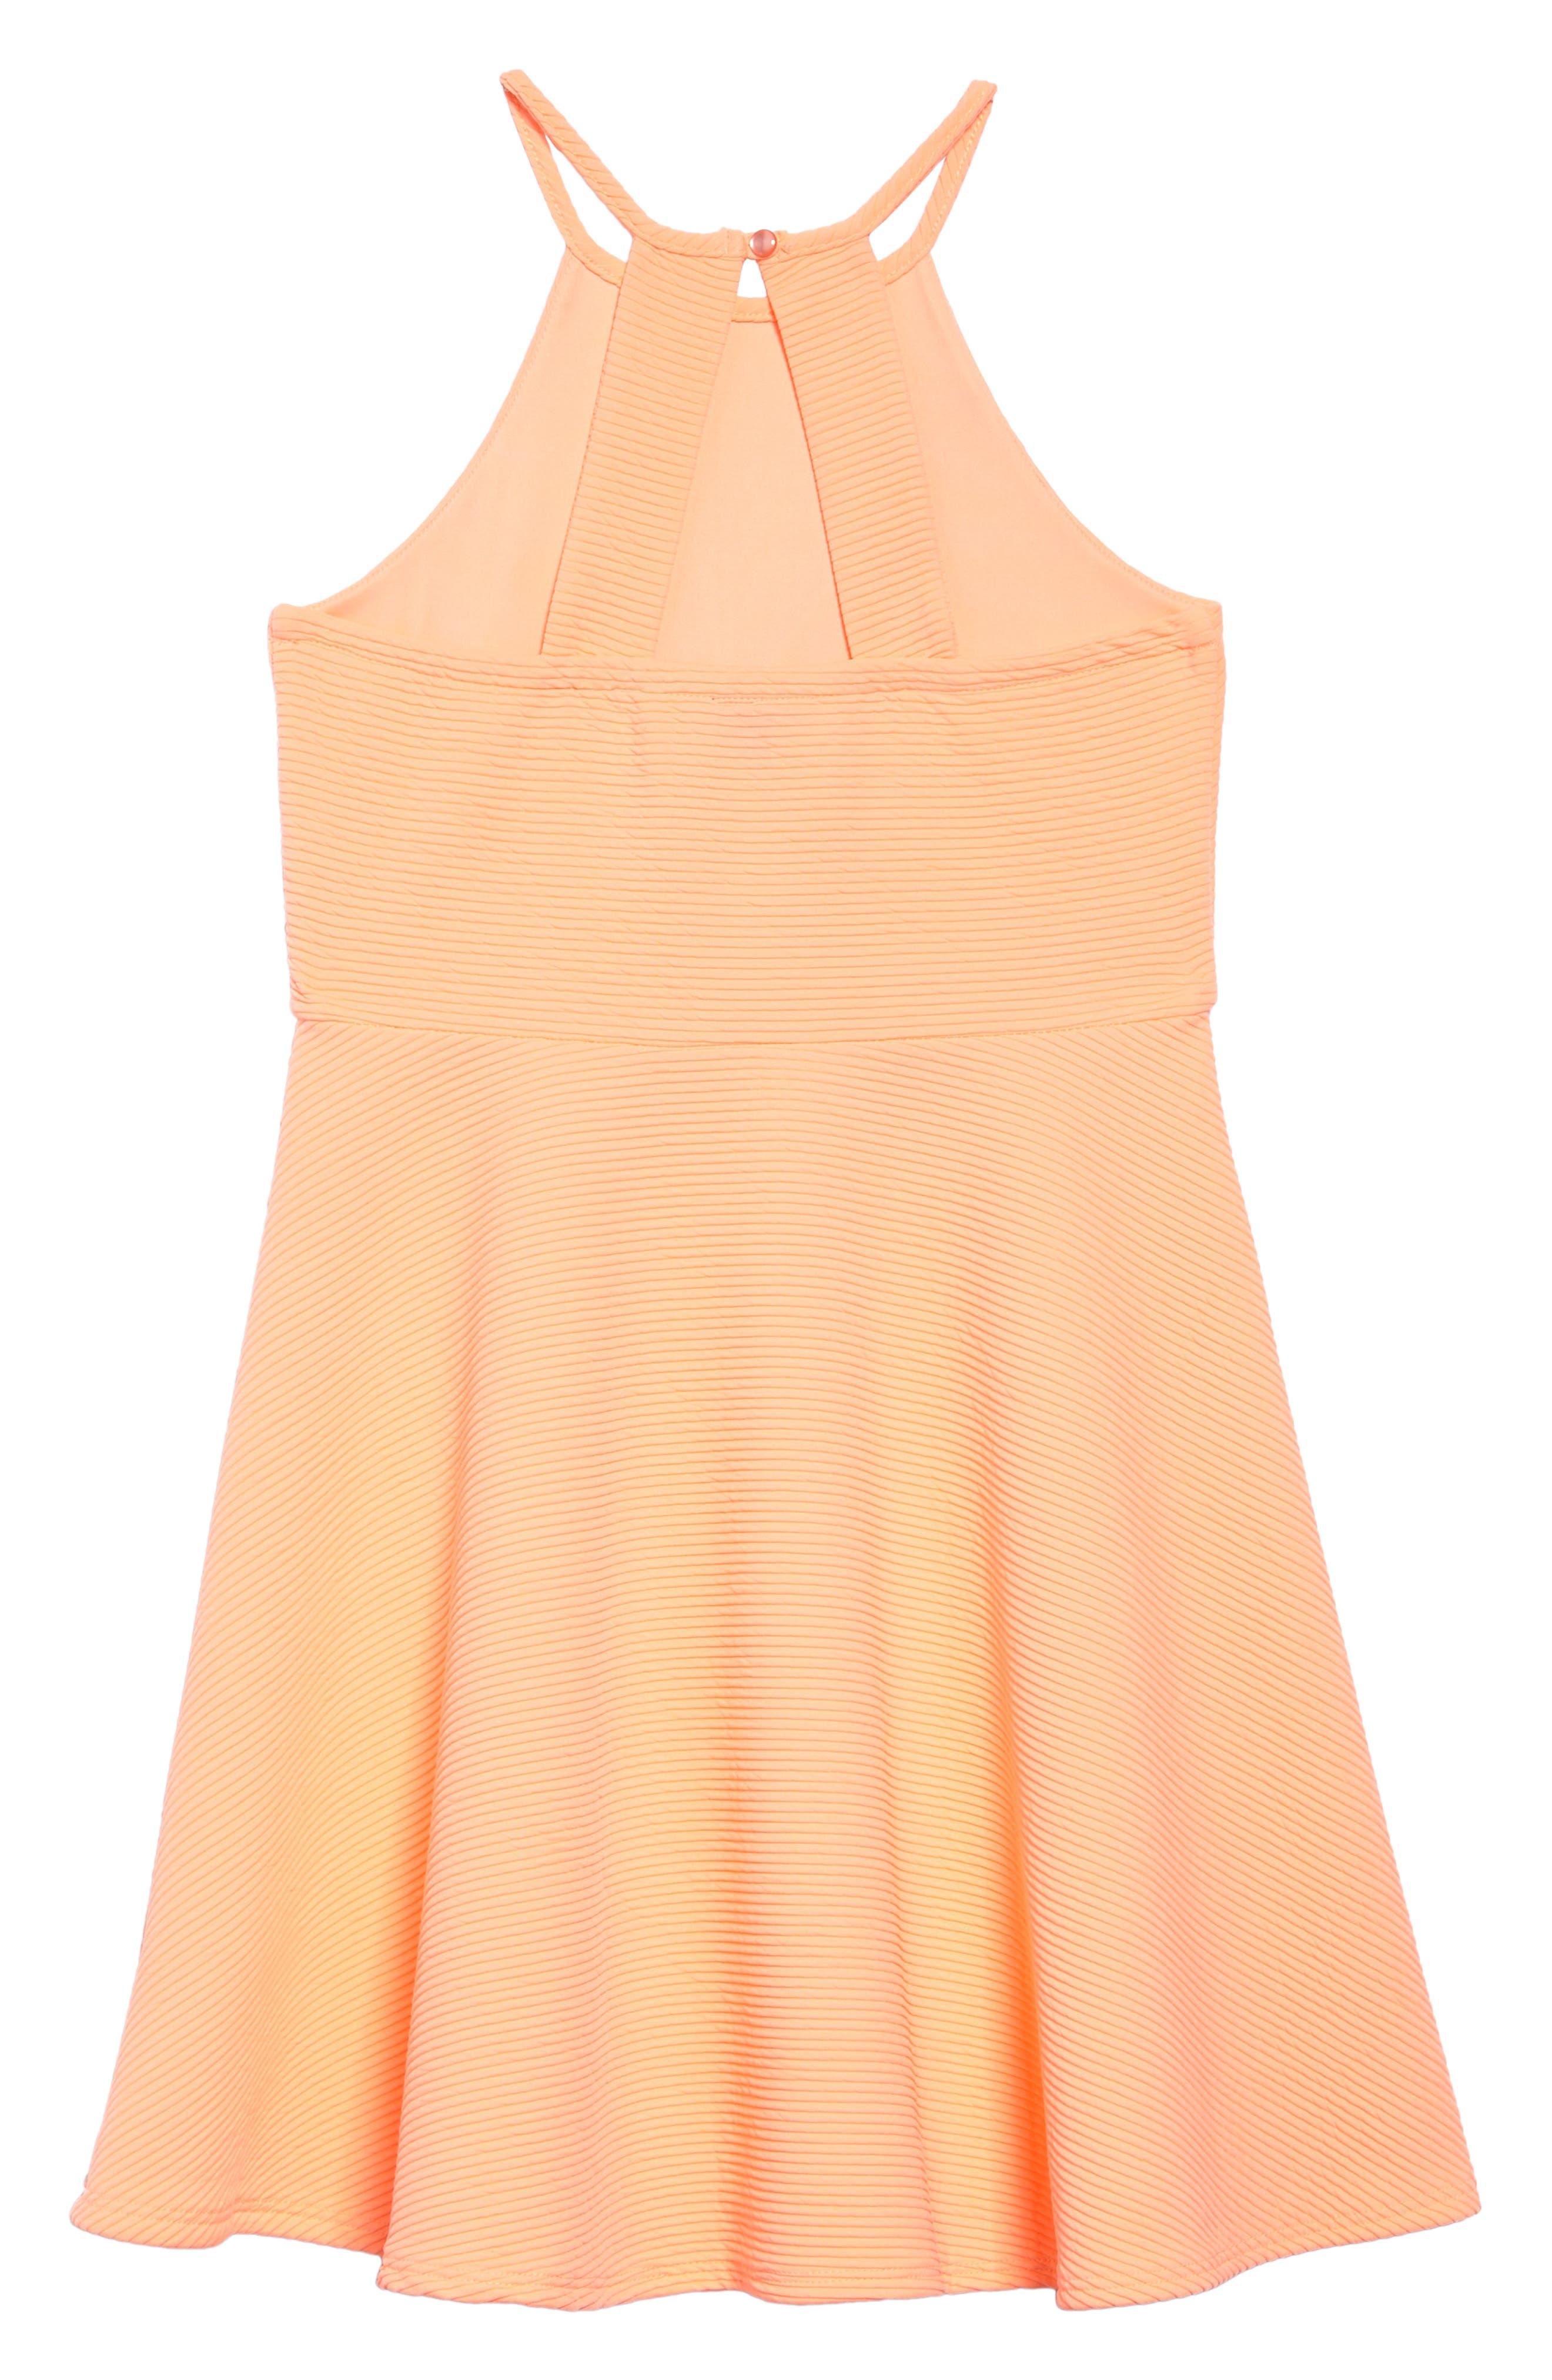 Textured Skater Dress,                             Alternate thumbnail 2, color,                             Neoncoral